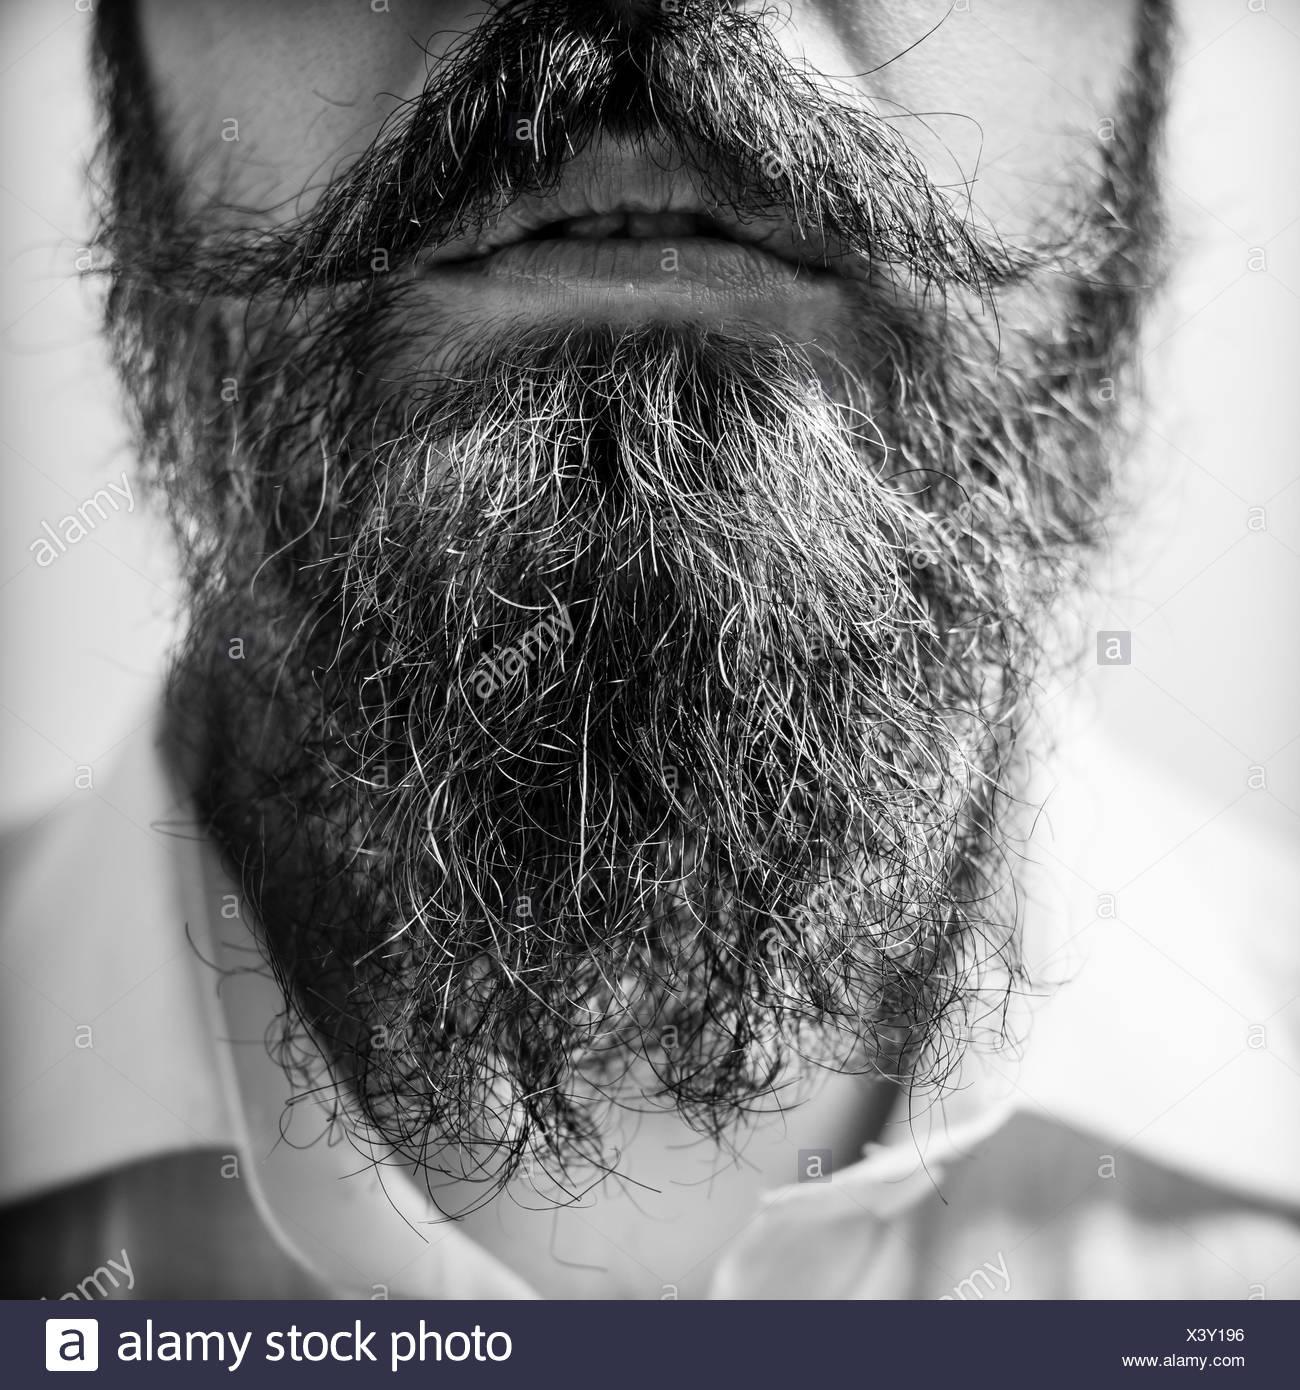 Close up of long beard and mustache man - Stock Image